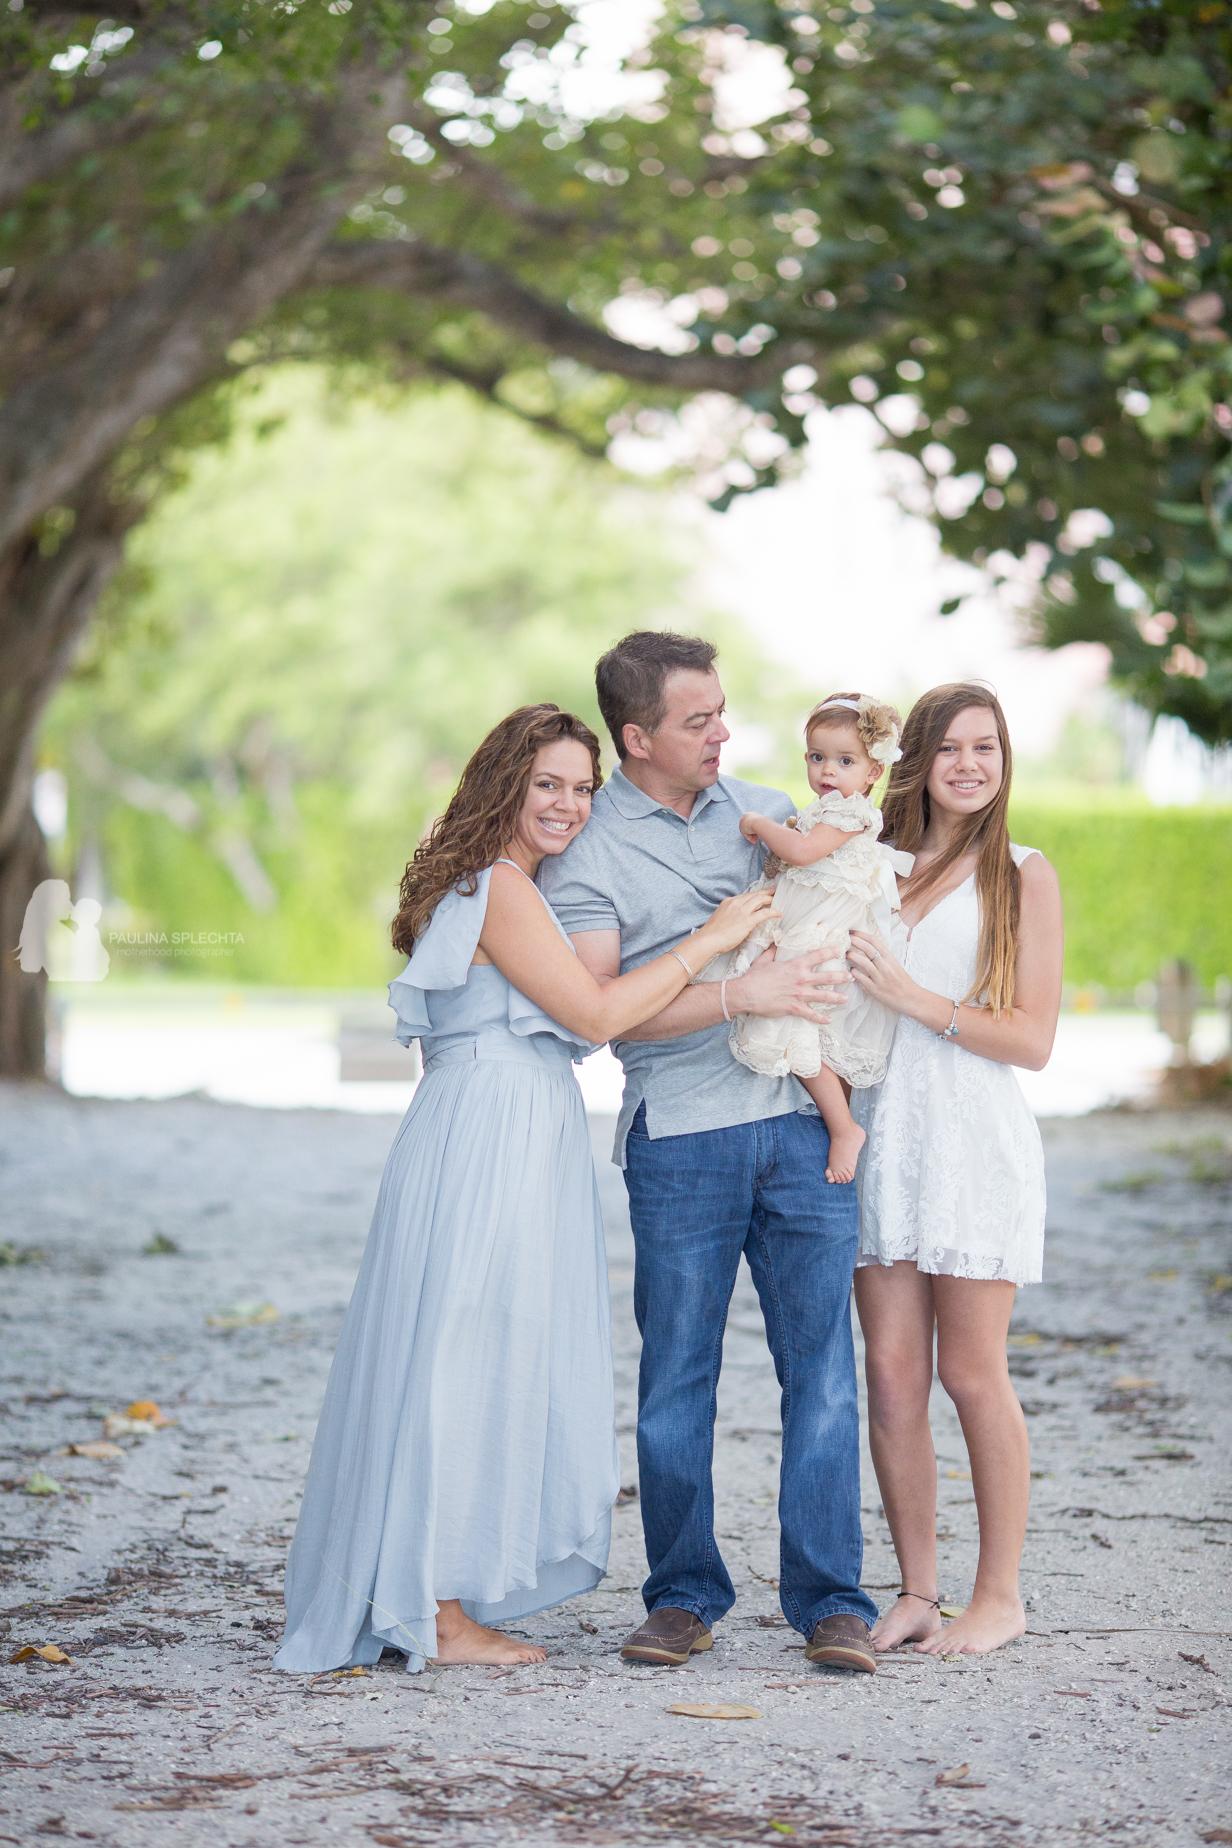 birth-photographer-breastfeeding-family-child-newborn-cake-smash-pregnancy-maternity-3.jpg